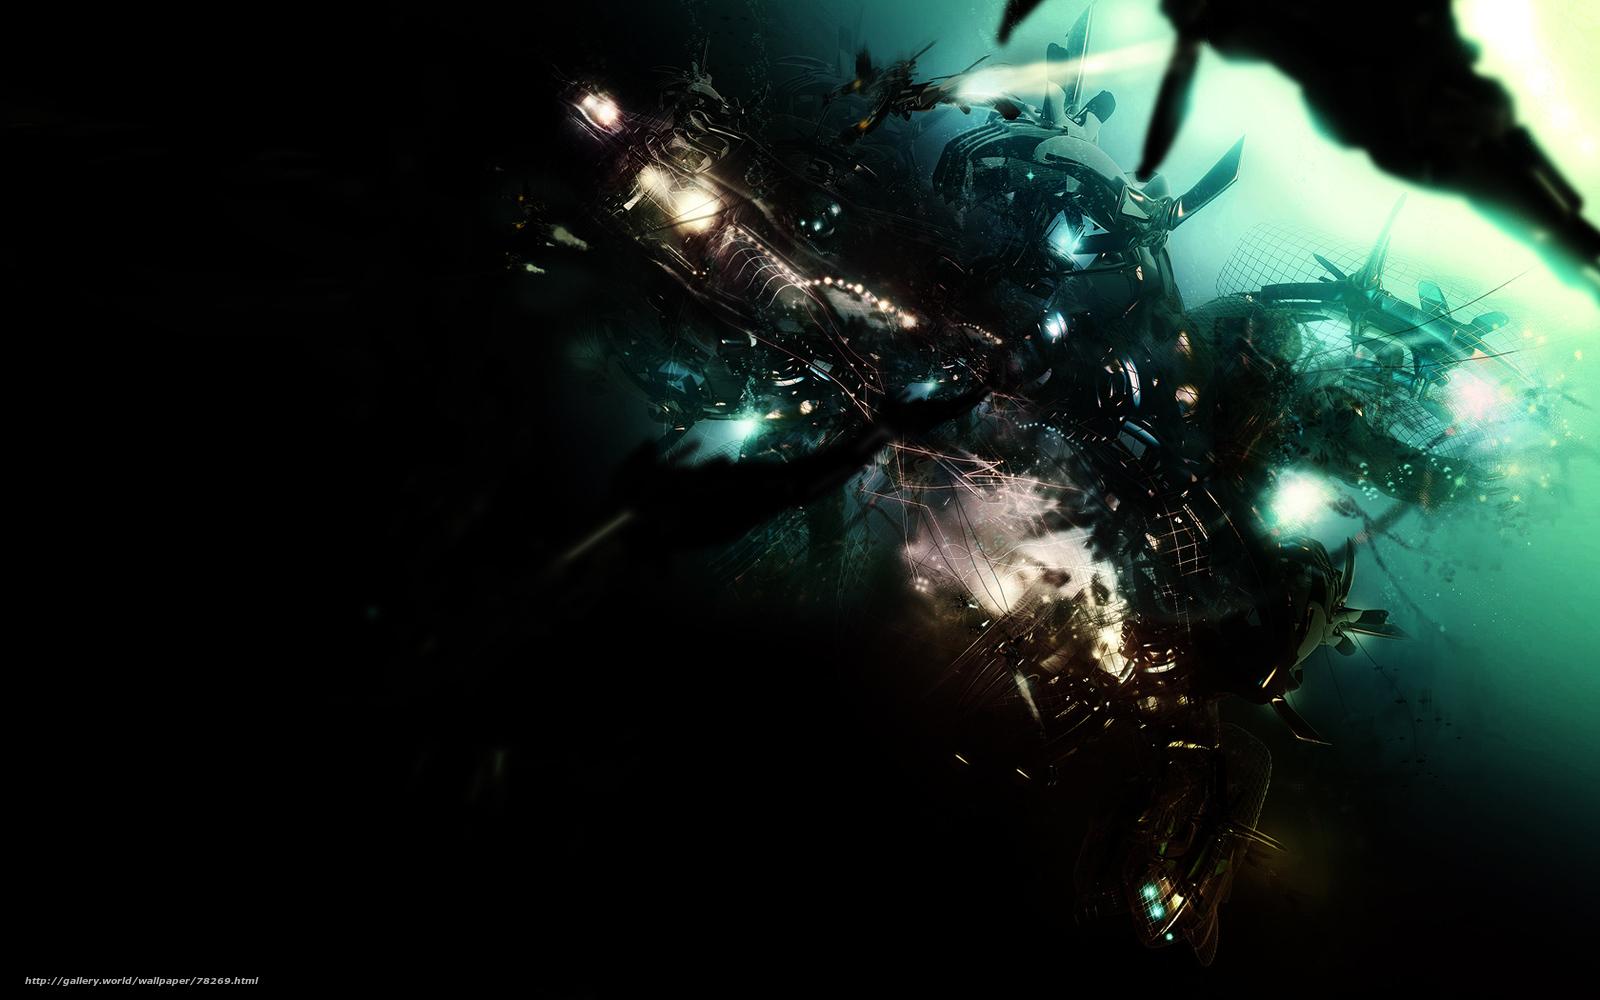 Tlcharger fond d 39 ecran abstraction sombre couleur for Fond ecran sombre